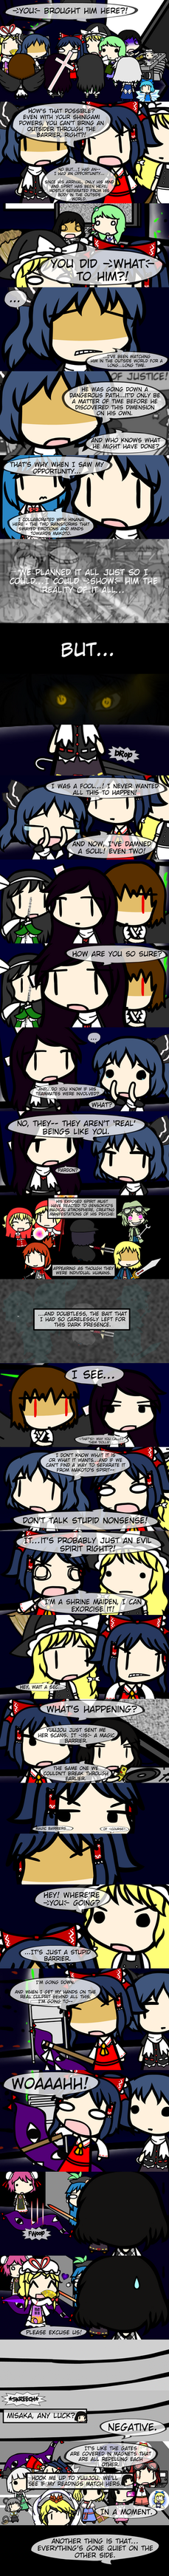 The Crossroad - Part 177 by Kigurou-Enkou